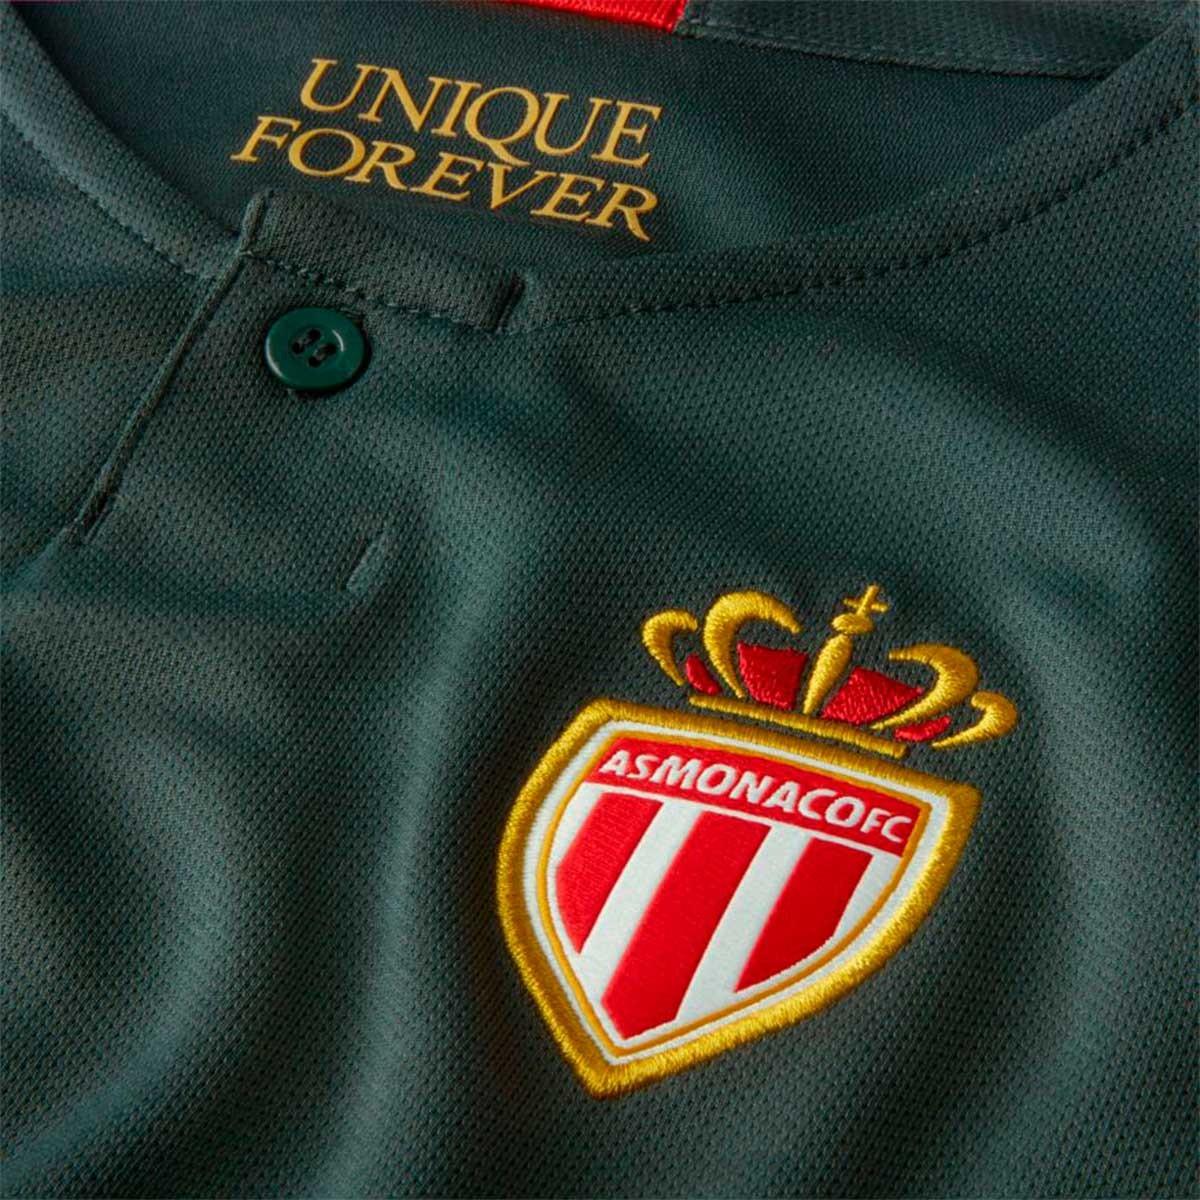 Camiseta AS Monaco niños